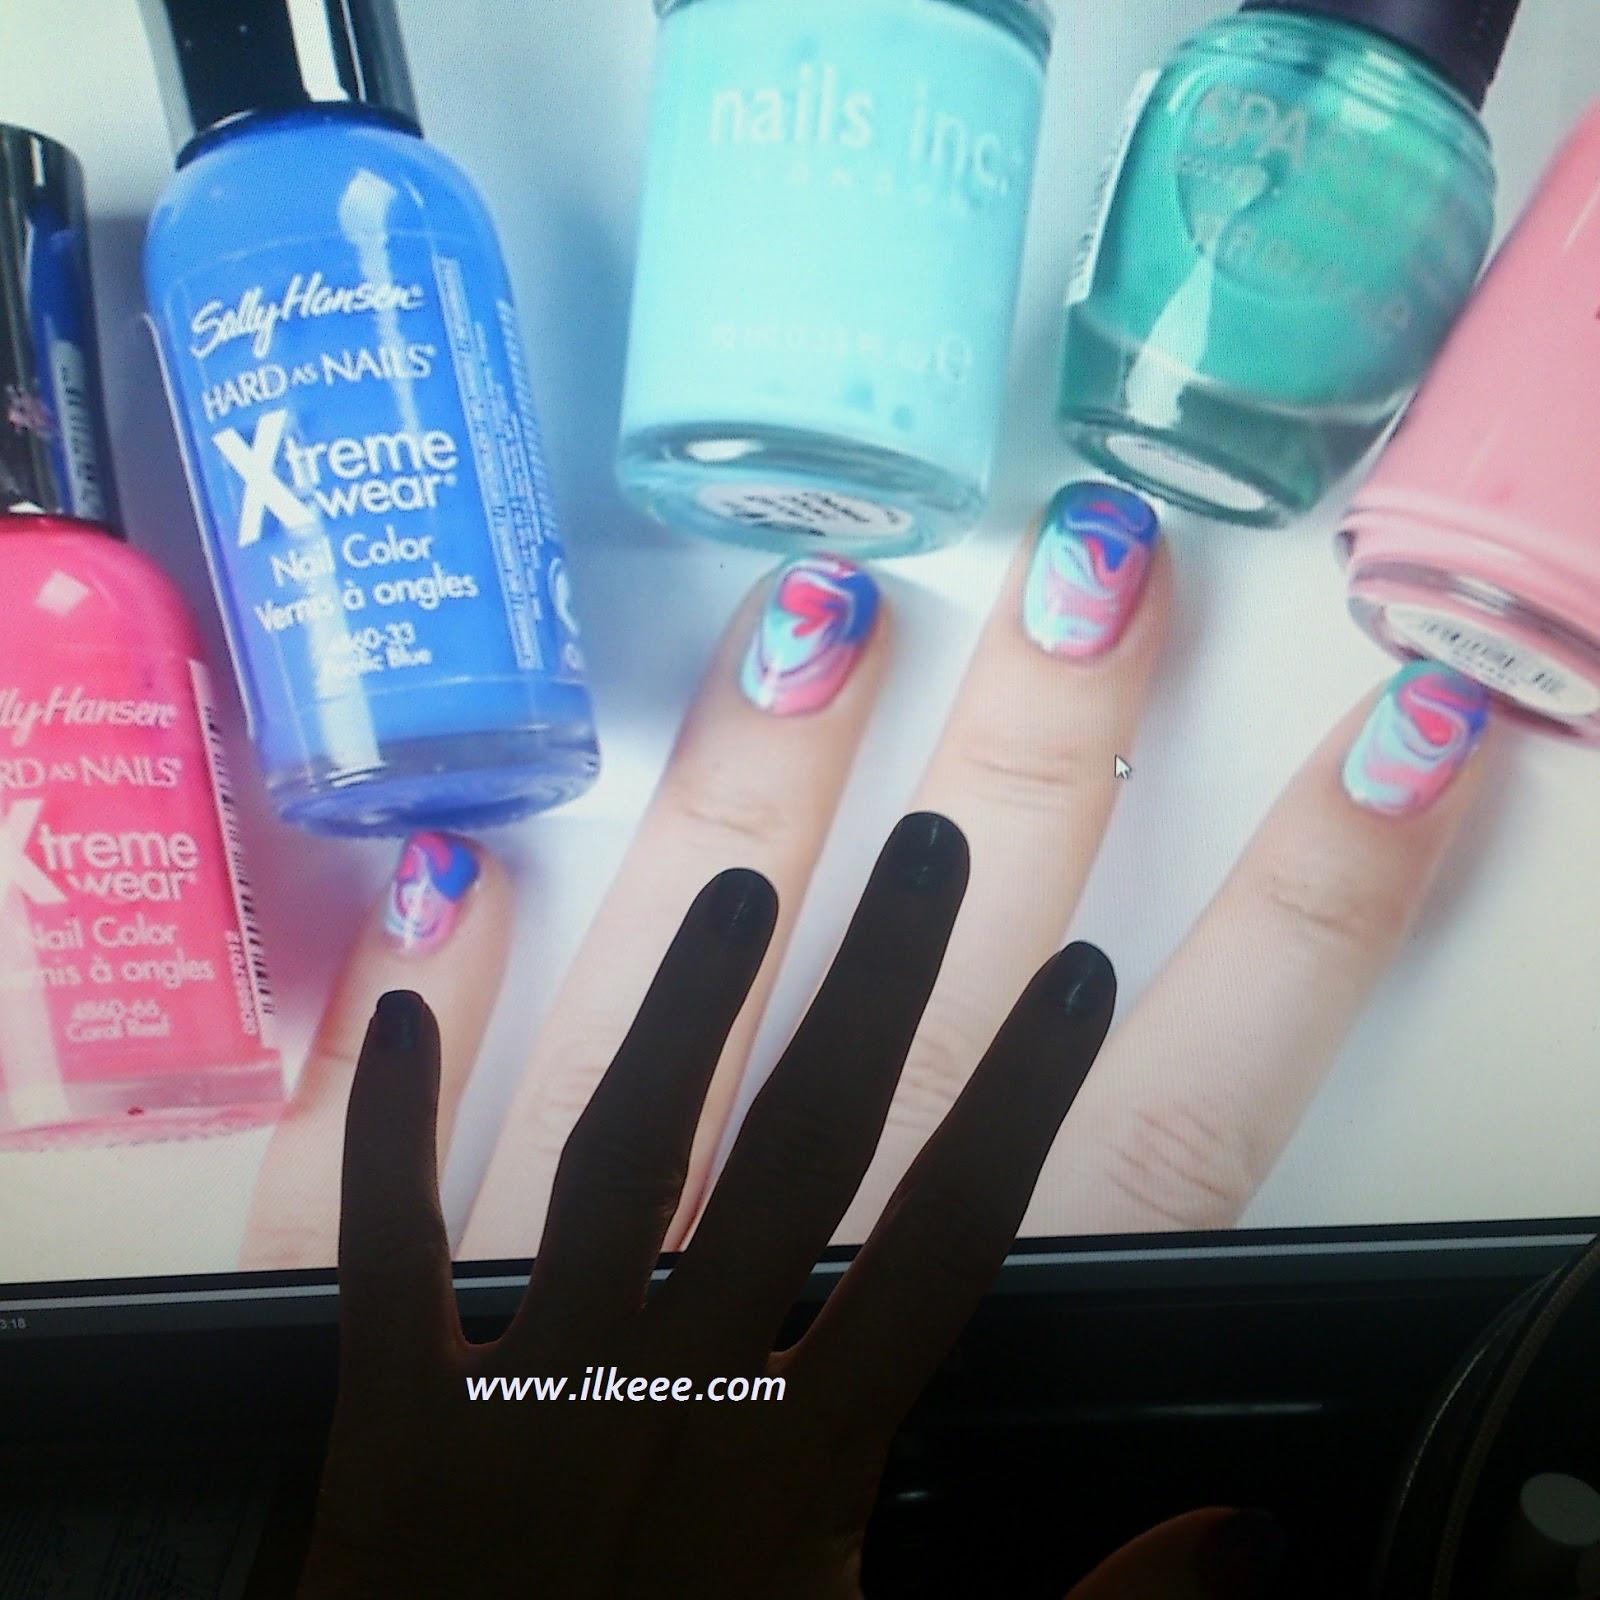 Kolay nail art çalışmaları - nailart - avon oje - flormar oje - note kozmetik oje